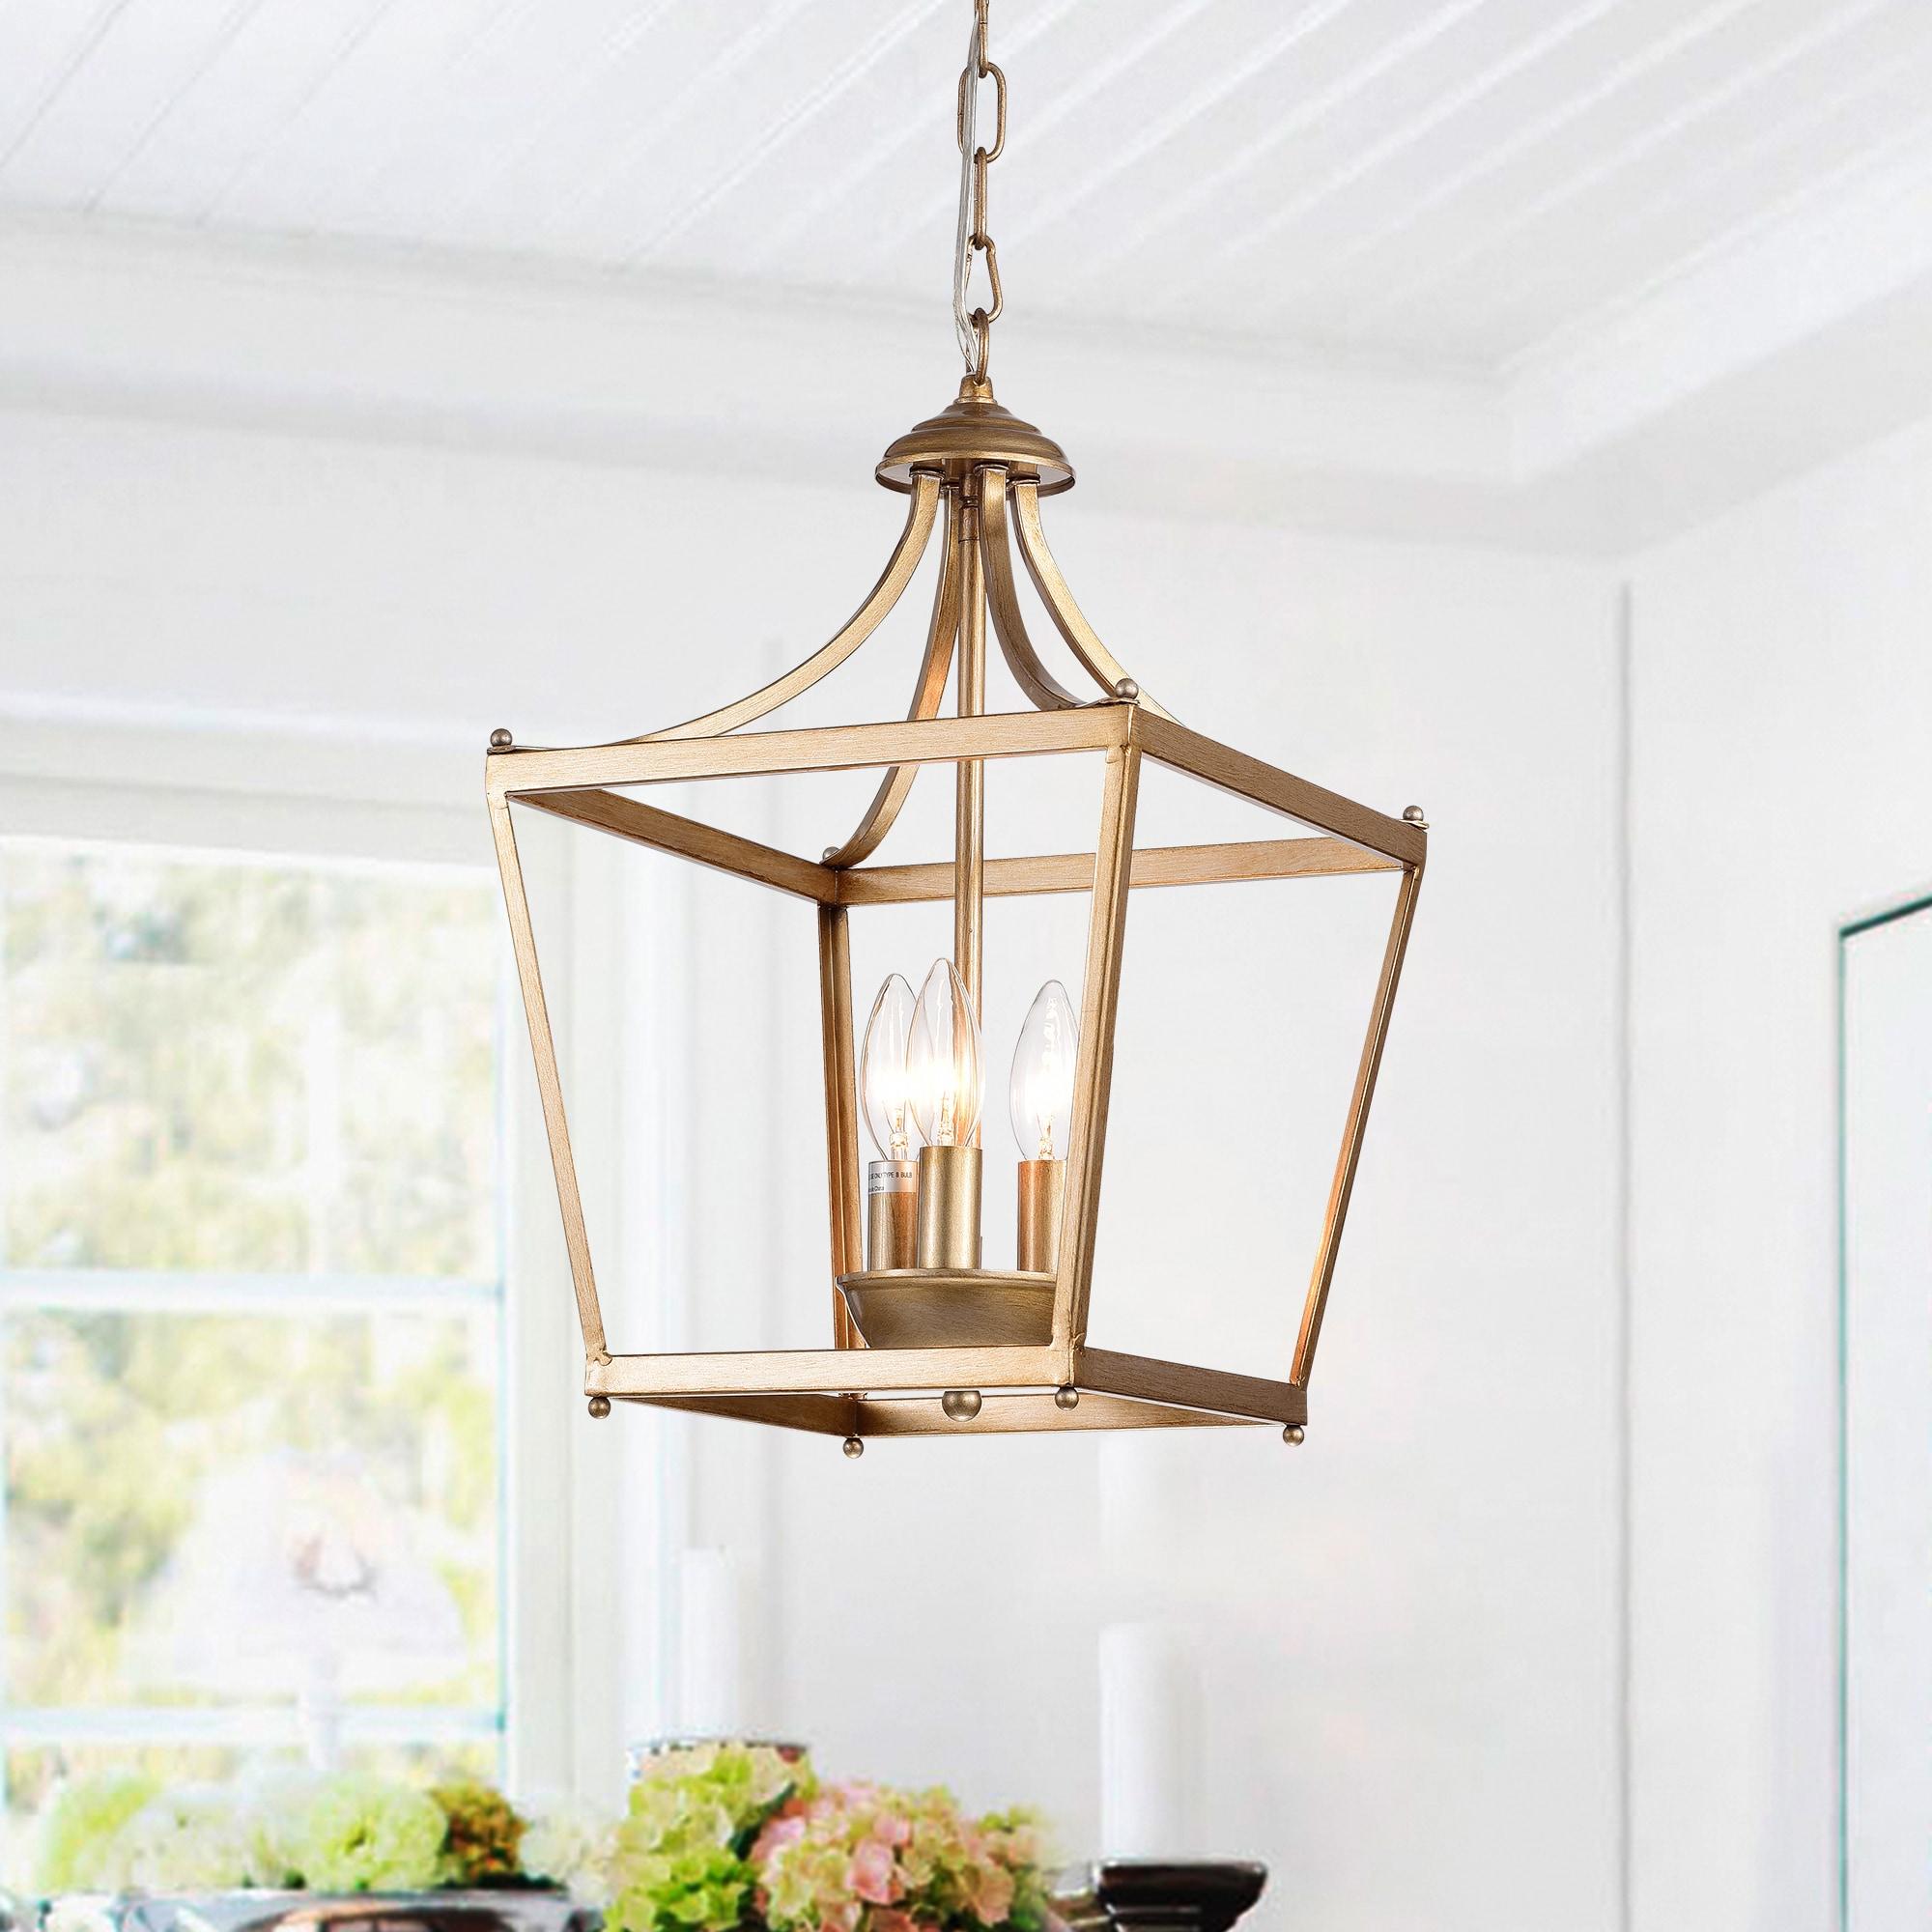 Warehouse Of Tiffany Sunsus Gold 3 Light Lantern Pendant (11 Pertaining To Finnick 3 Light Lantern Pendants (View 7 of 30)